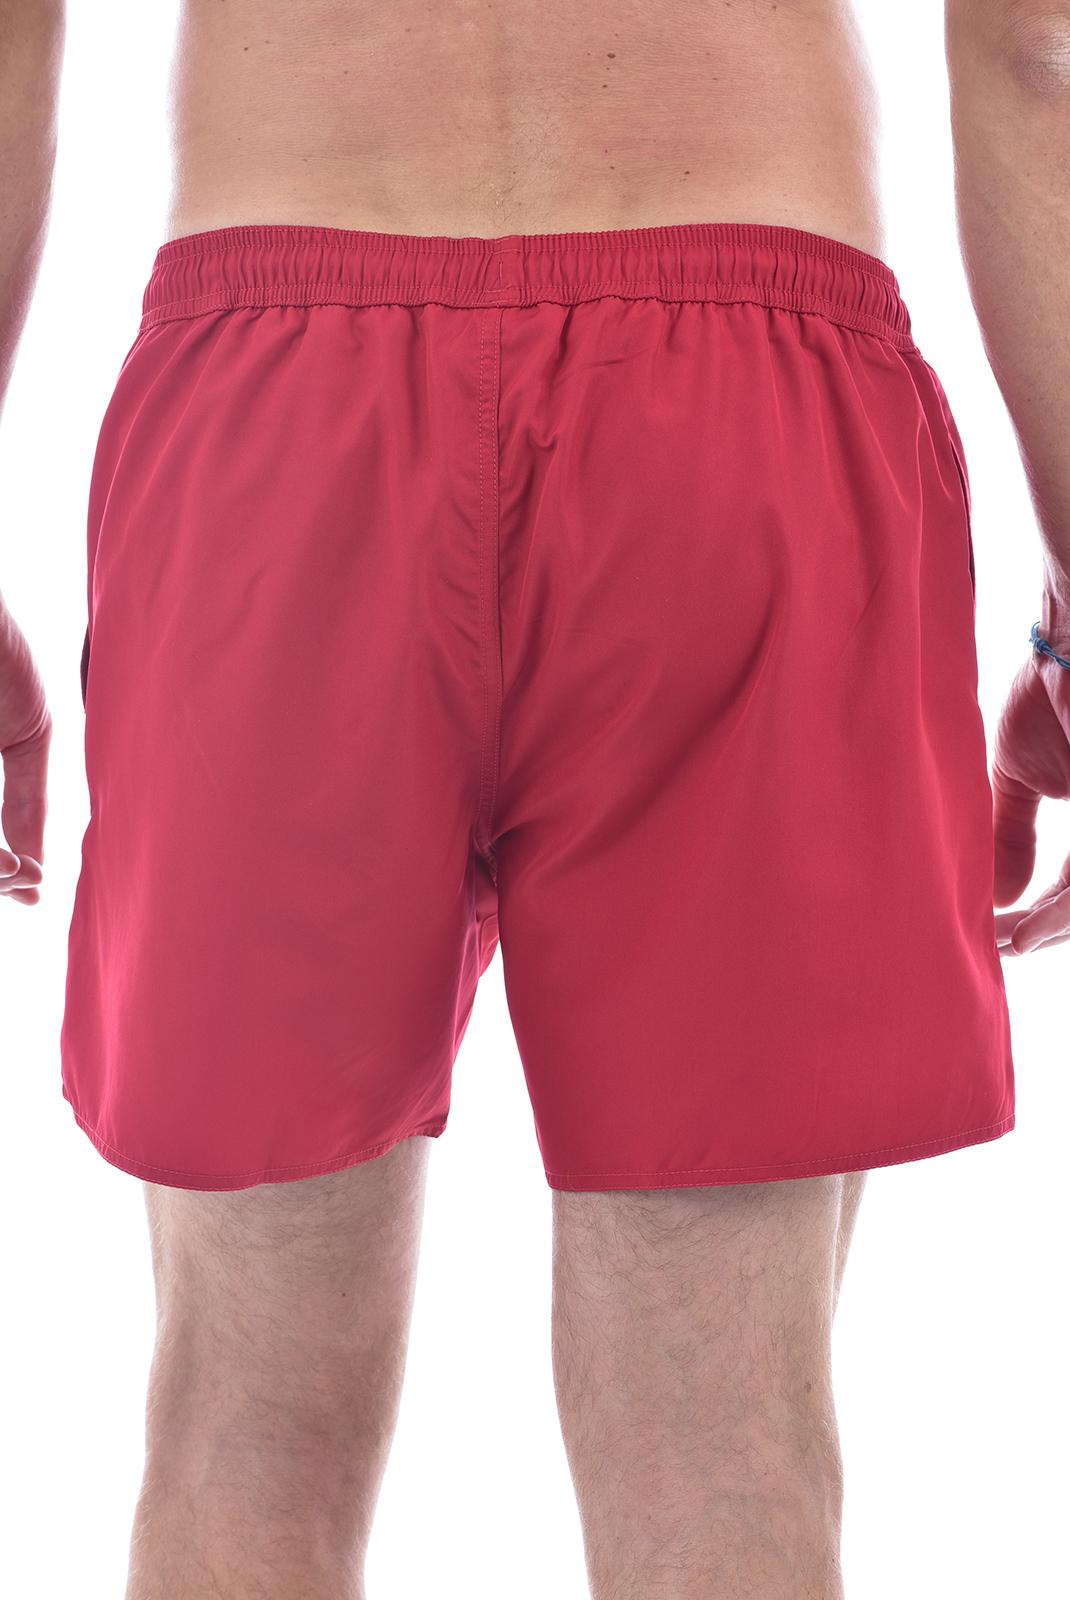 Shorts de bain  Emporio armani 211740 0P427 00173 RUBY RED